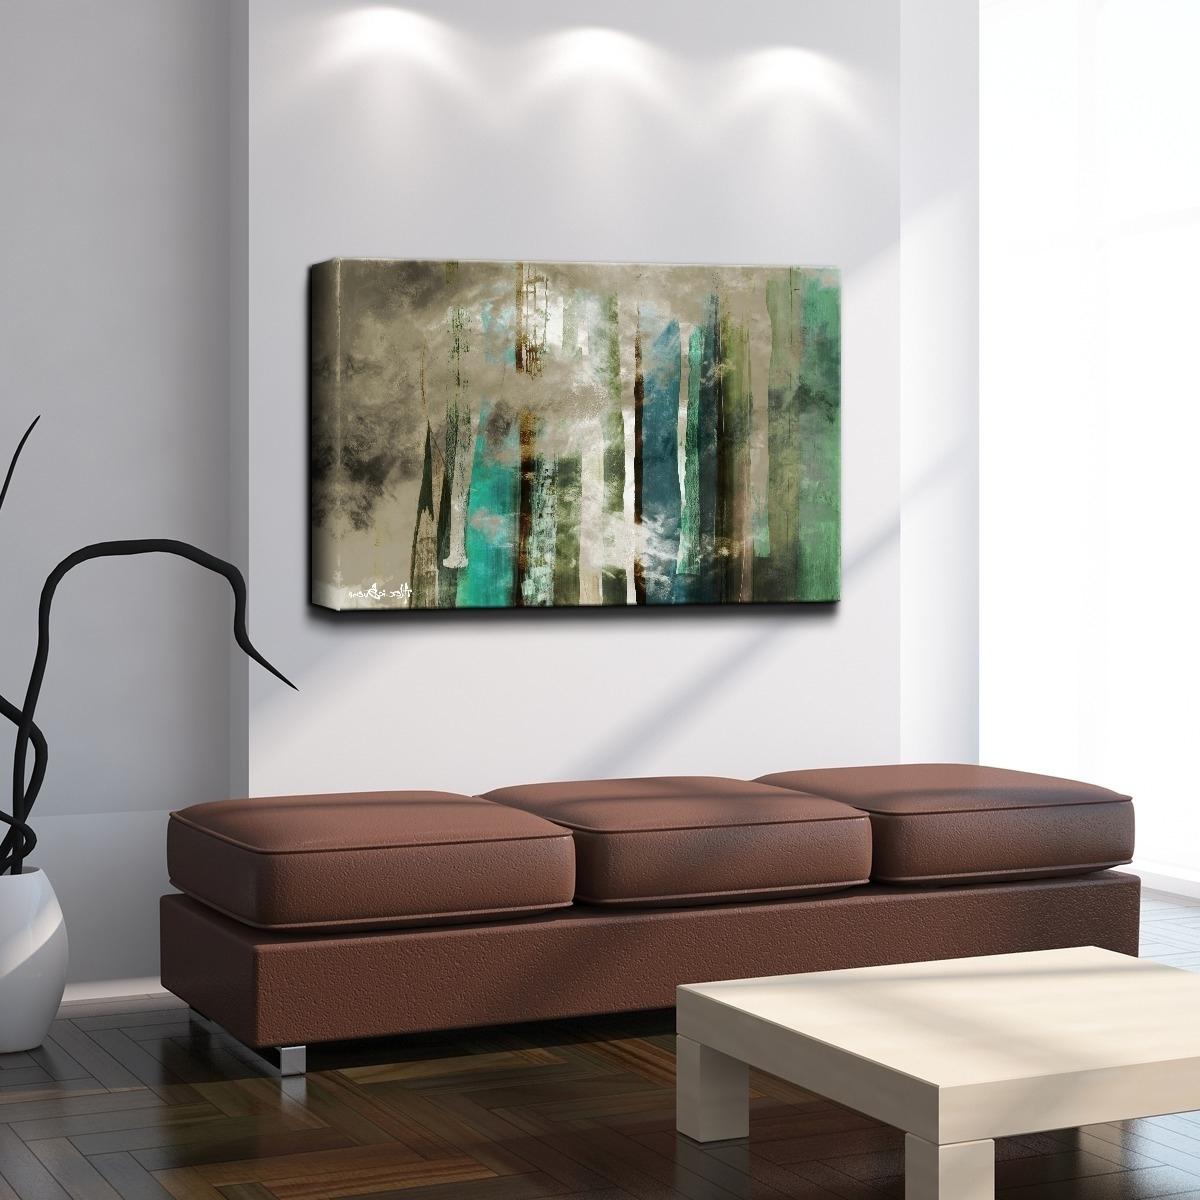 Shop Ready2Hangart 'smash Vi' Oversized Canvas Wall Art – Blue Inside Most Popular Oversized Canvas Wall Art (View 10 of 15)